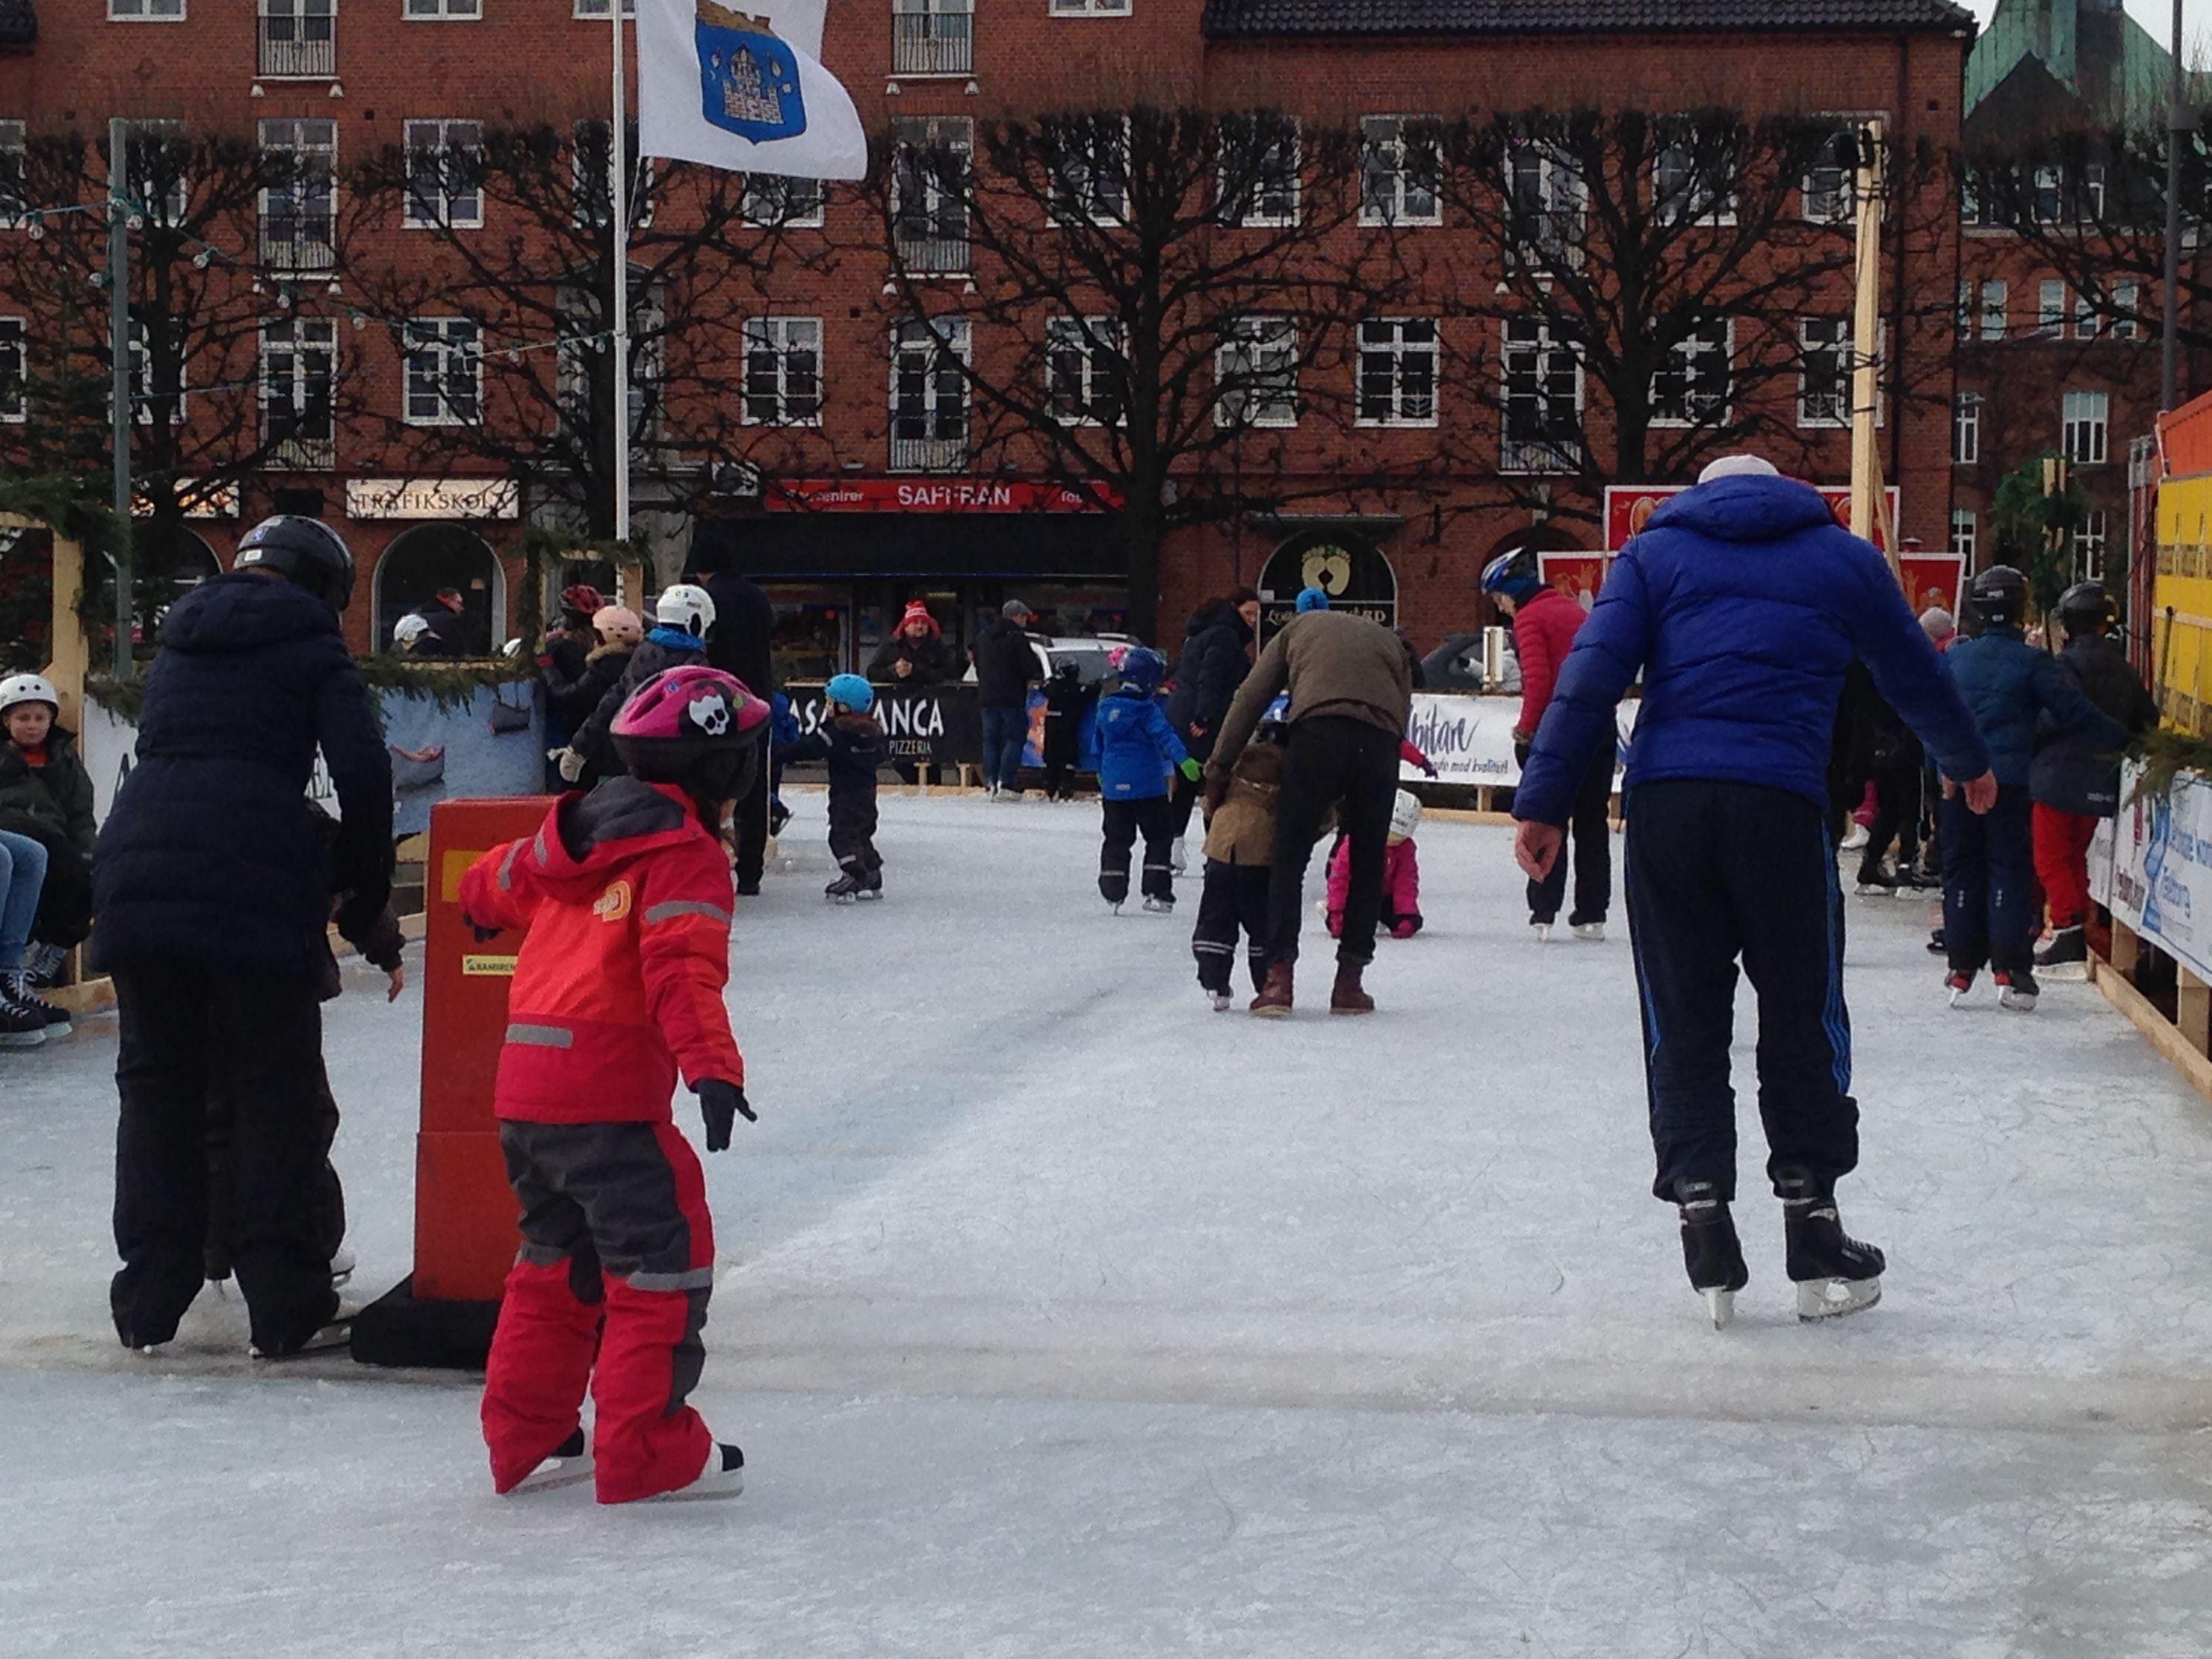 Isormen- skating rink